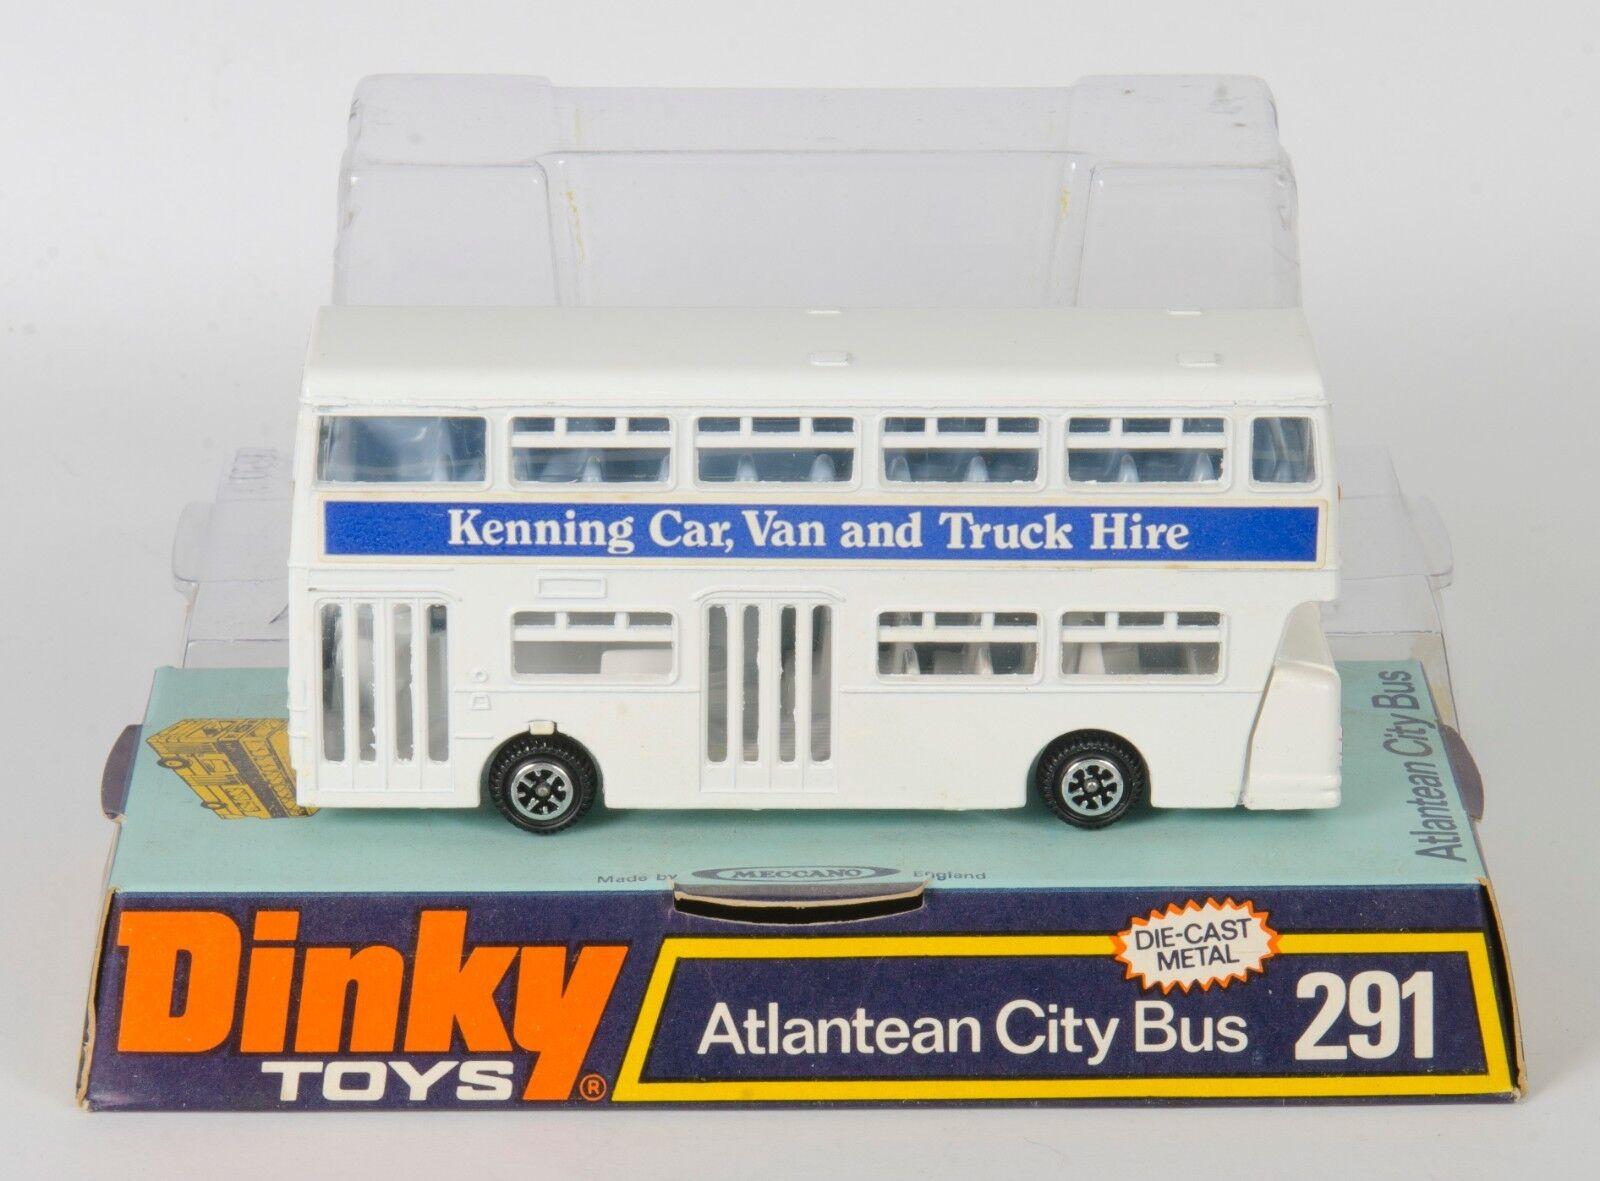 Dinky Toys 291 Atlantean City Bus. blanc. Kenning Hire.  VNMINT Boxed 1970's  acheter une marque